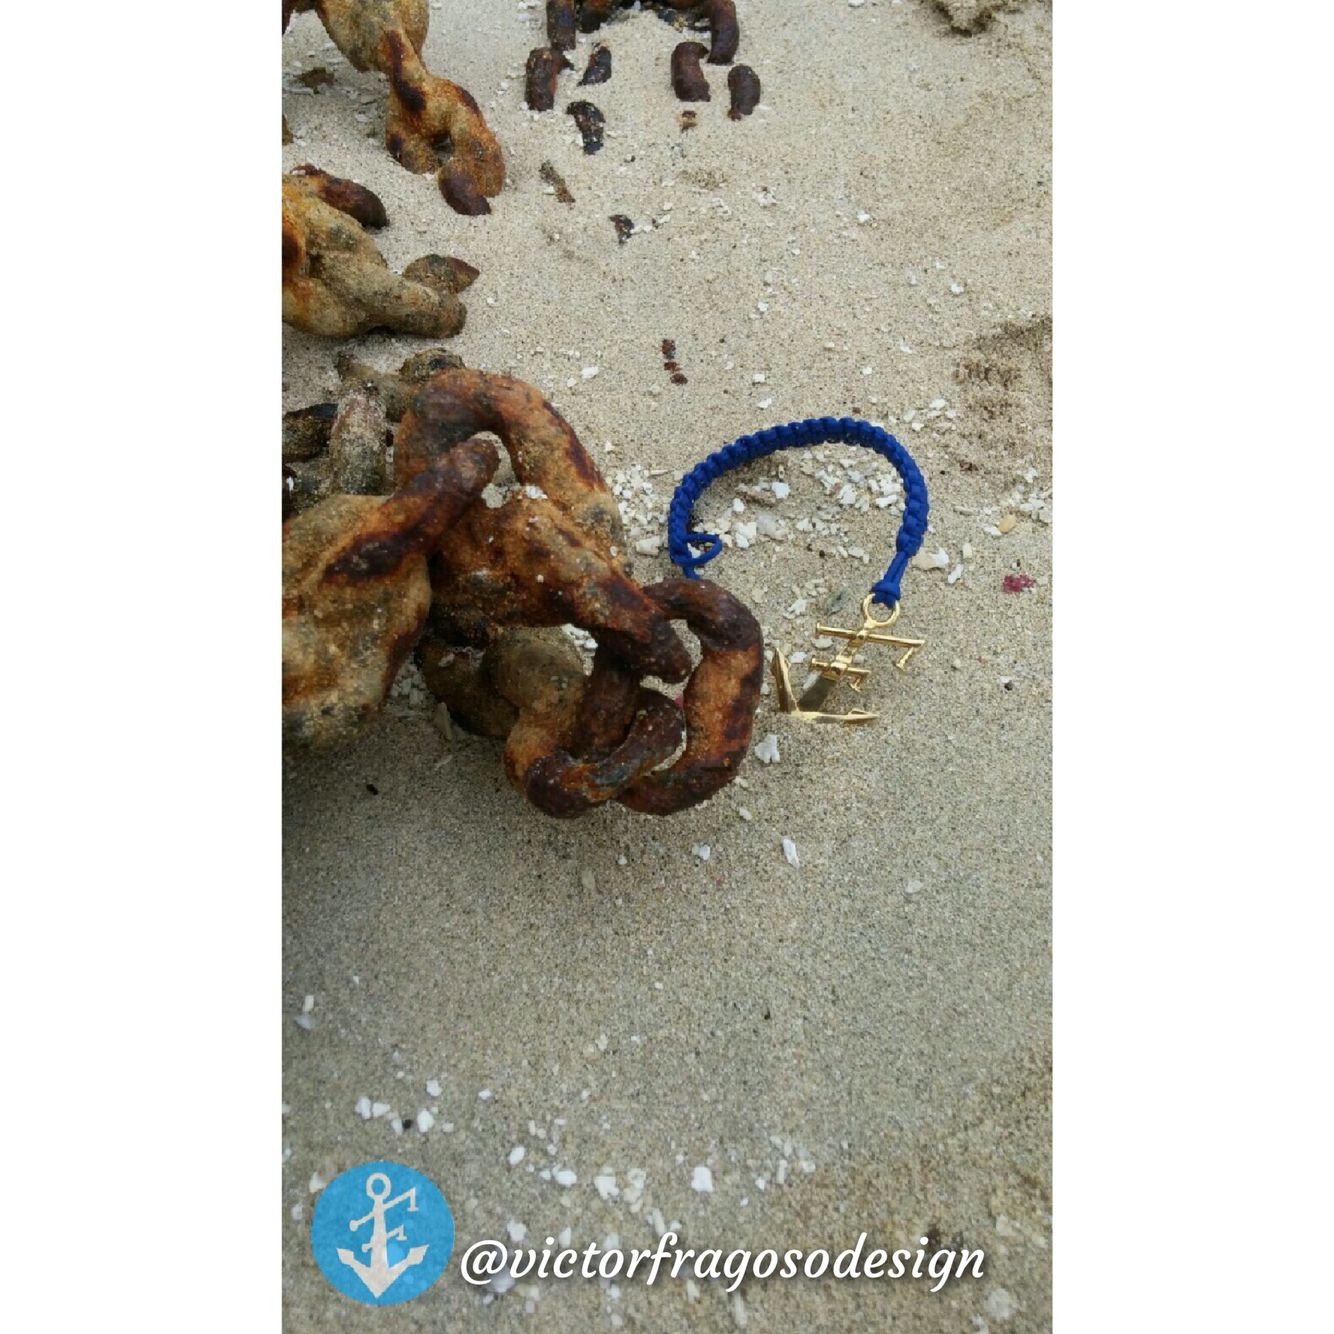 Refuse to sink #victorfragosodesign #nauticalchic #instastyle #fashion #beach #sand #menstyle #waves #miamibeach #keywest